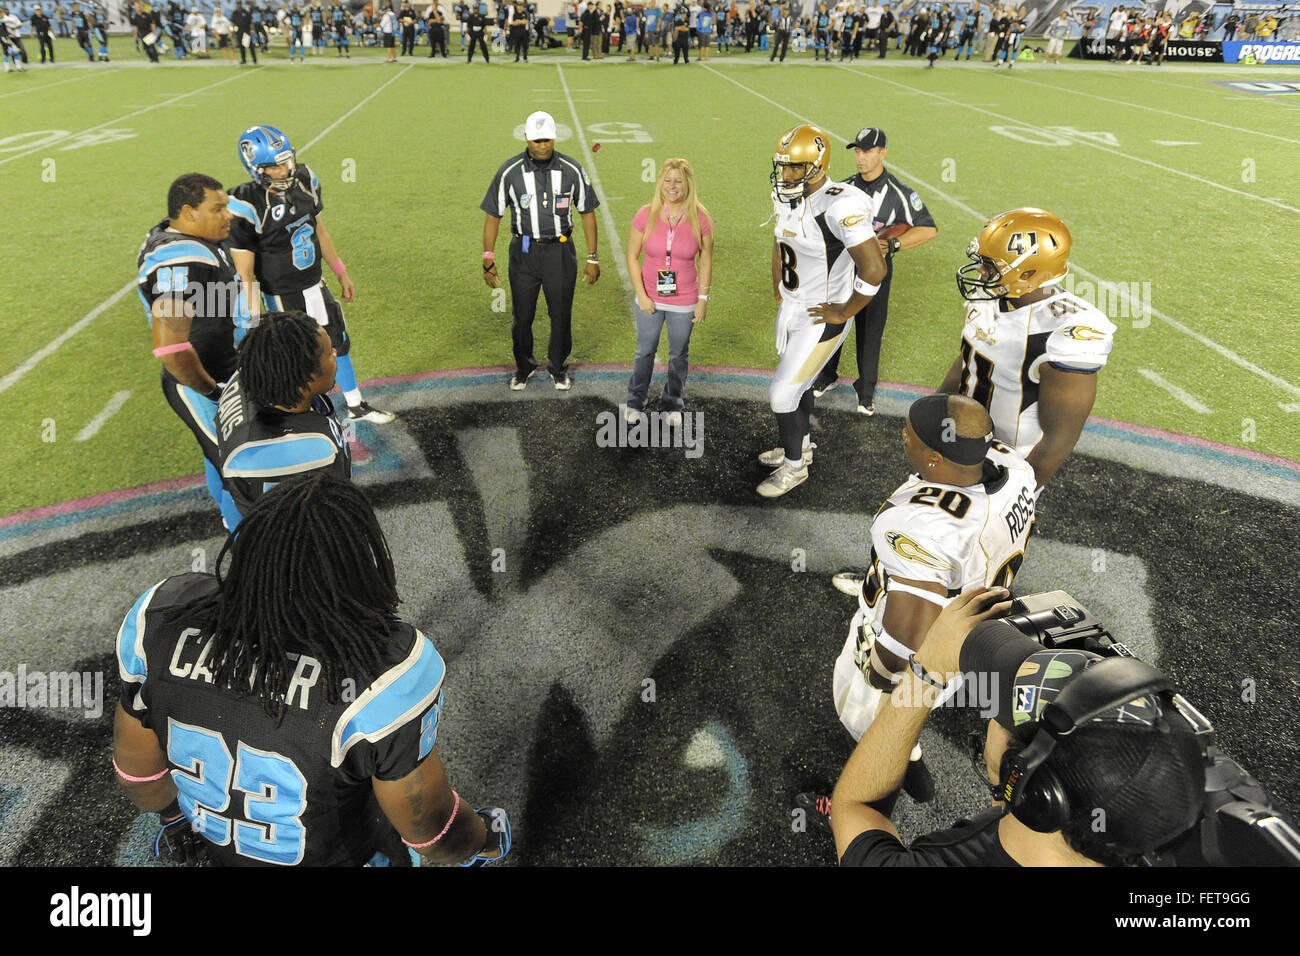 Orlando, Florida, USA. 21st Oct, 2010. Oct 21, 2010; Orlando, Fla.: Coin flip prior to the Florida Tuskers game - Stock Image